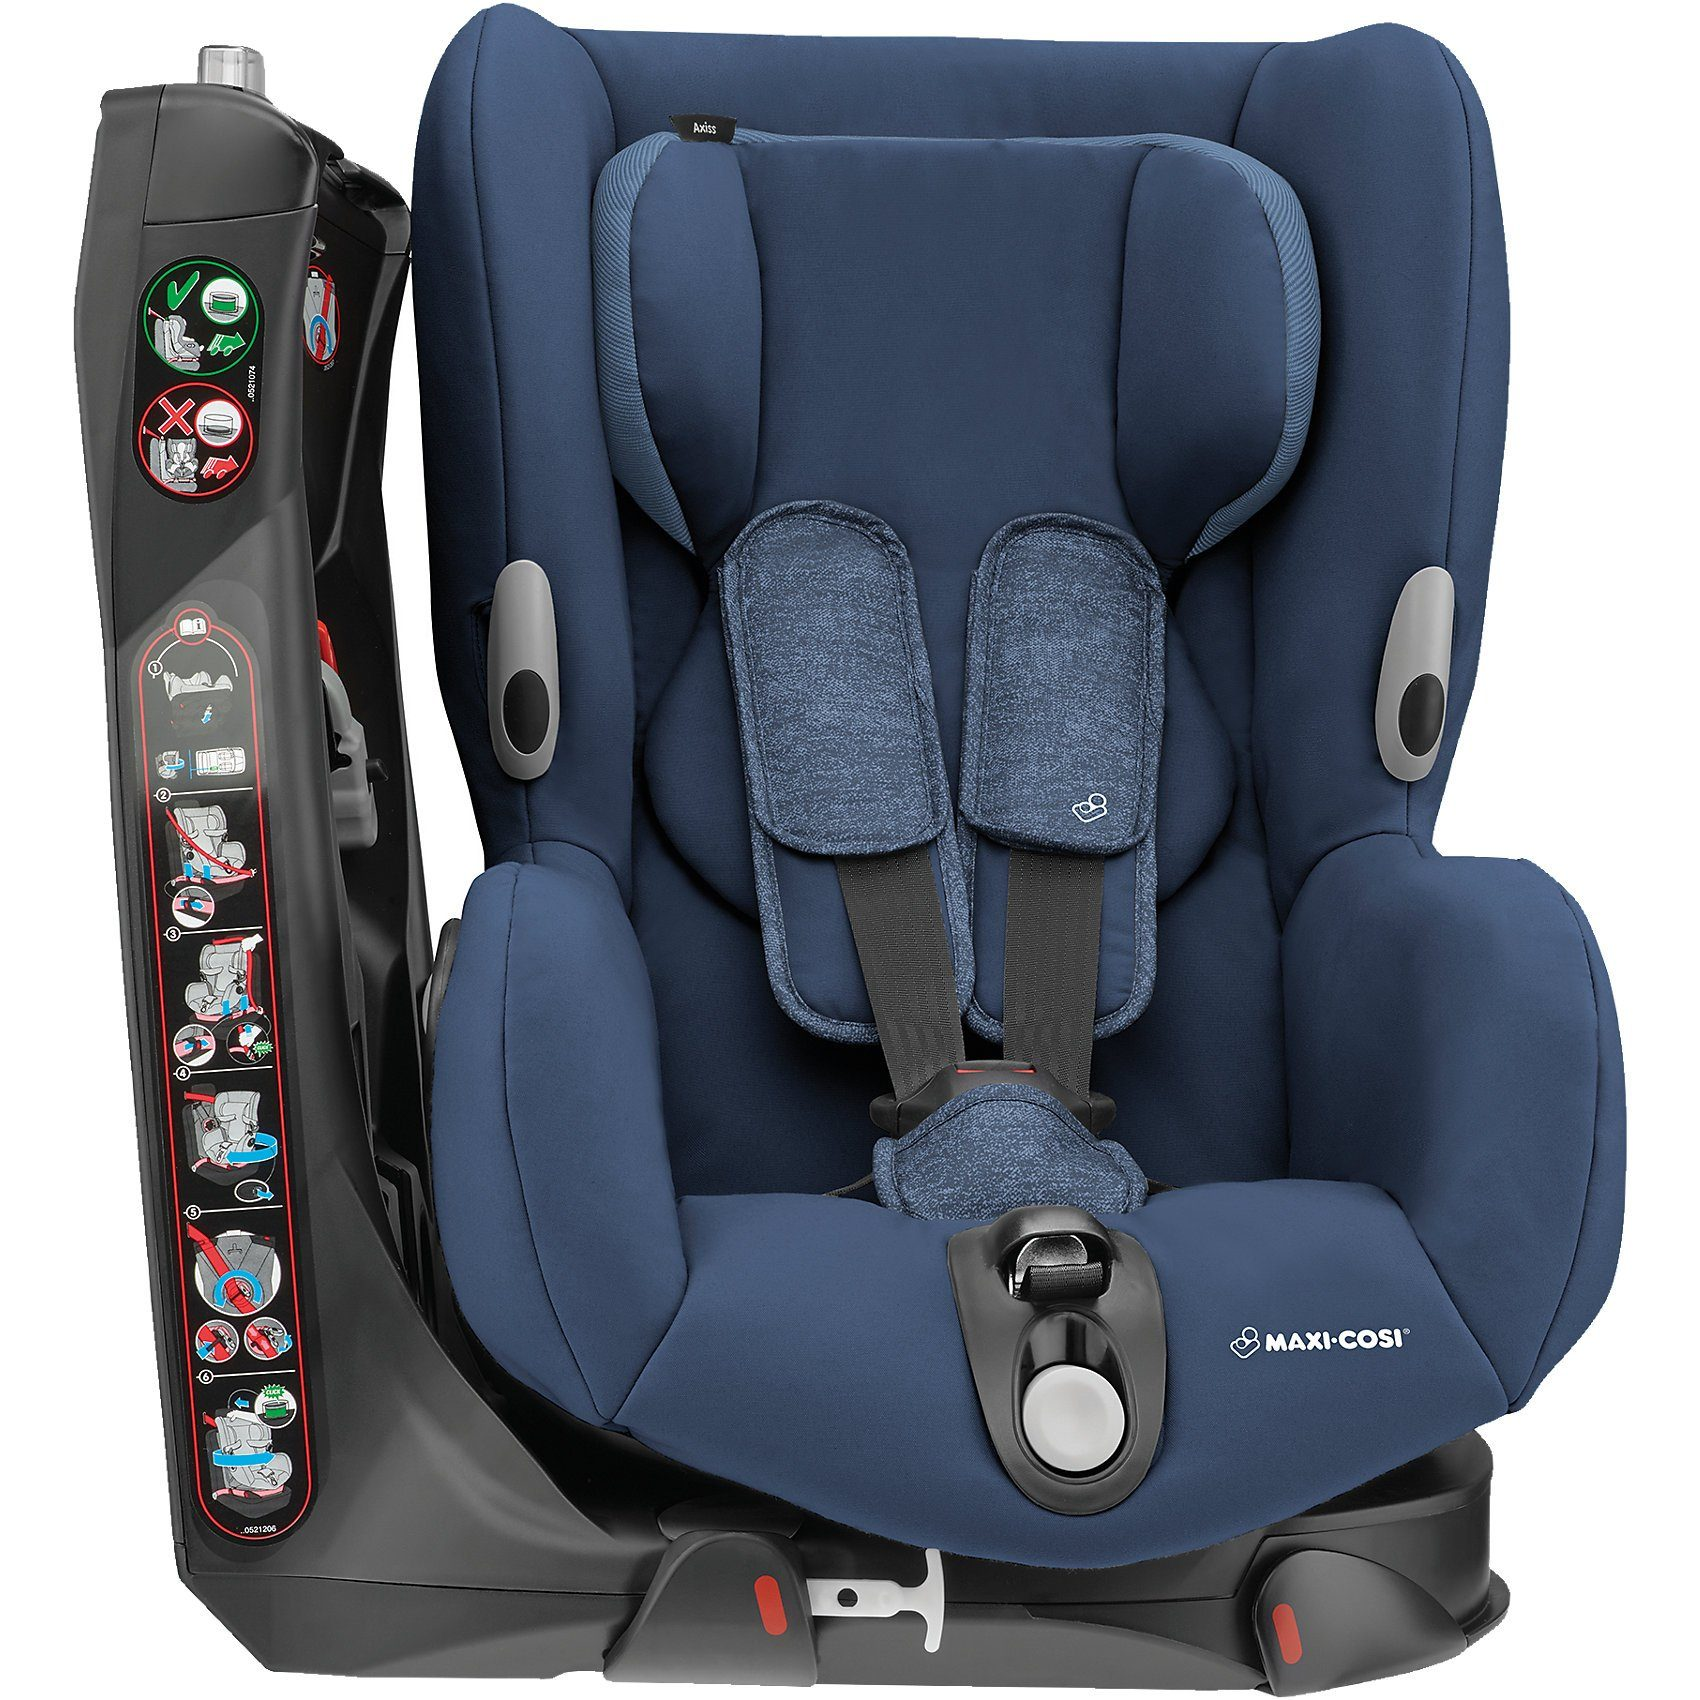 Maxi-Cosi Auto-Kindersitz Axiss, Nomad Blue, 2018